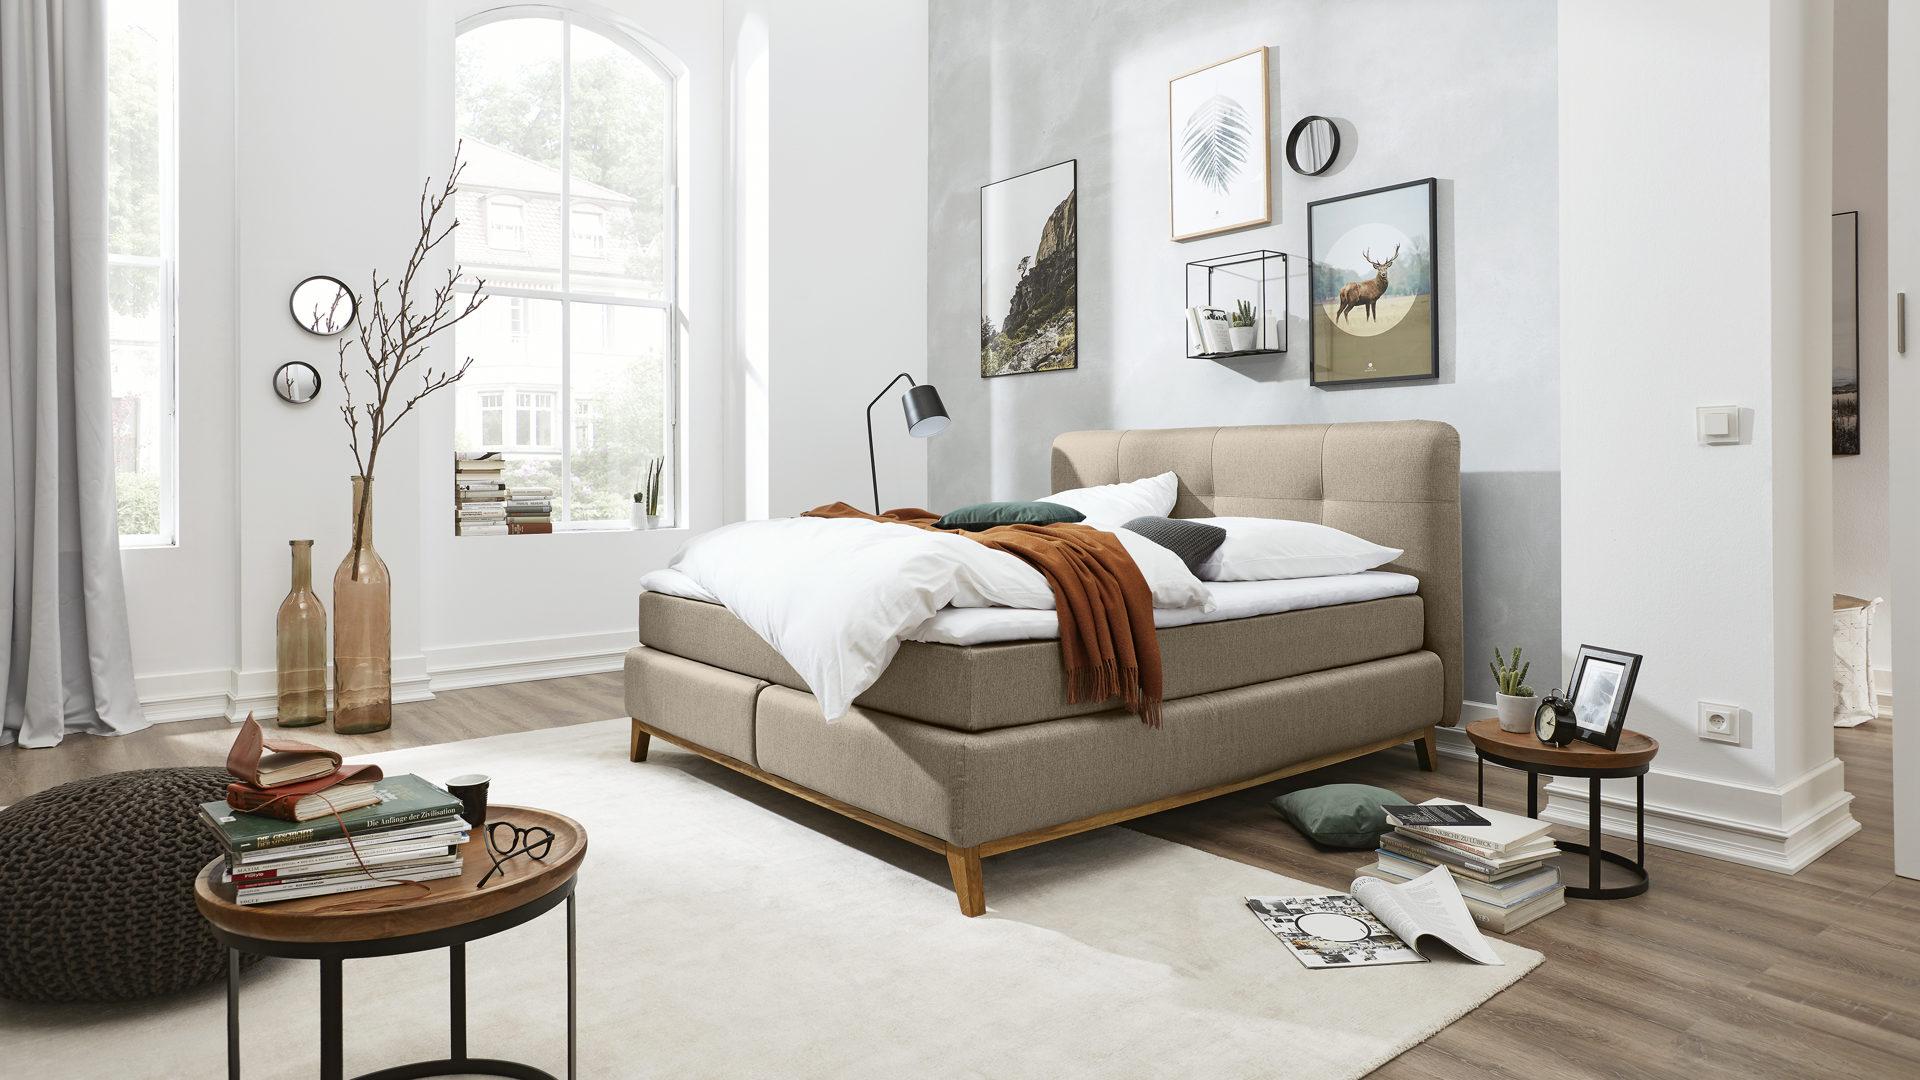 Möbel Boer Coesfeld, Räume, Schlafzimmer, Betten, Interliving, ruF ...